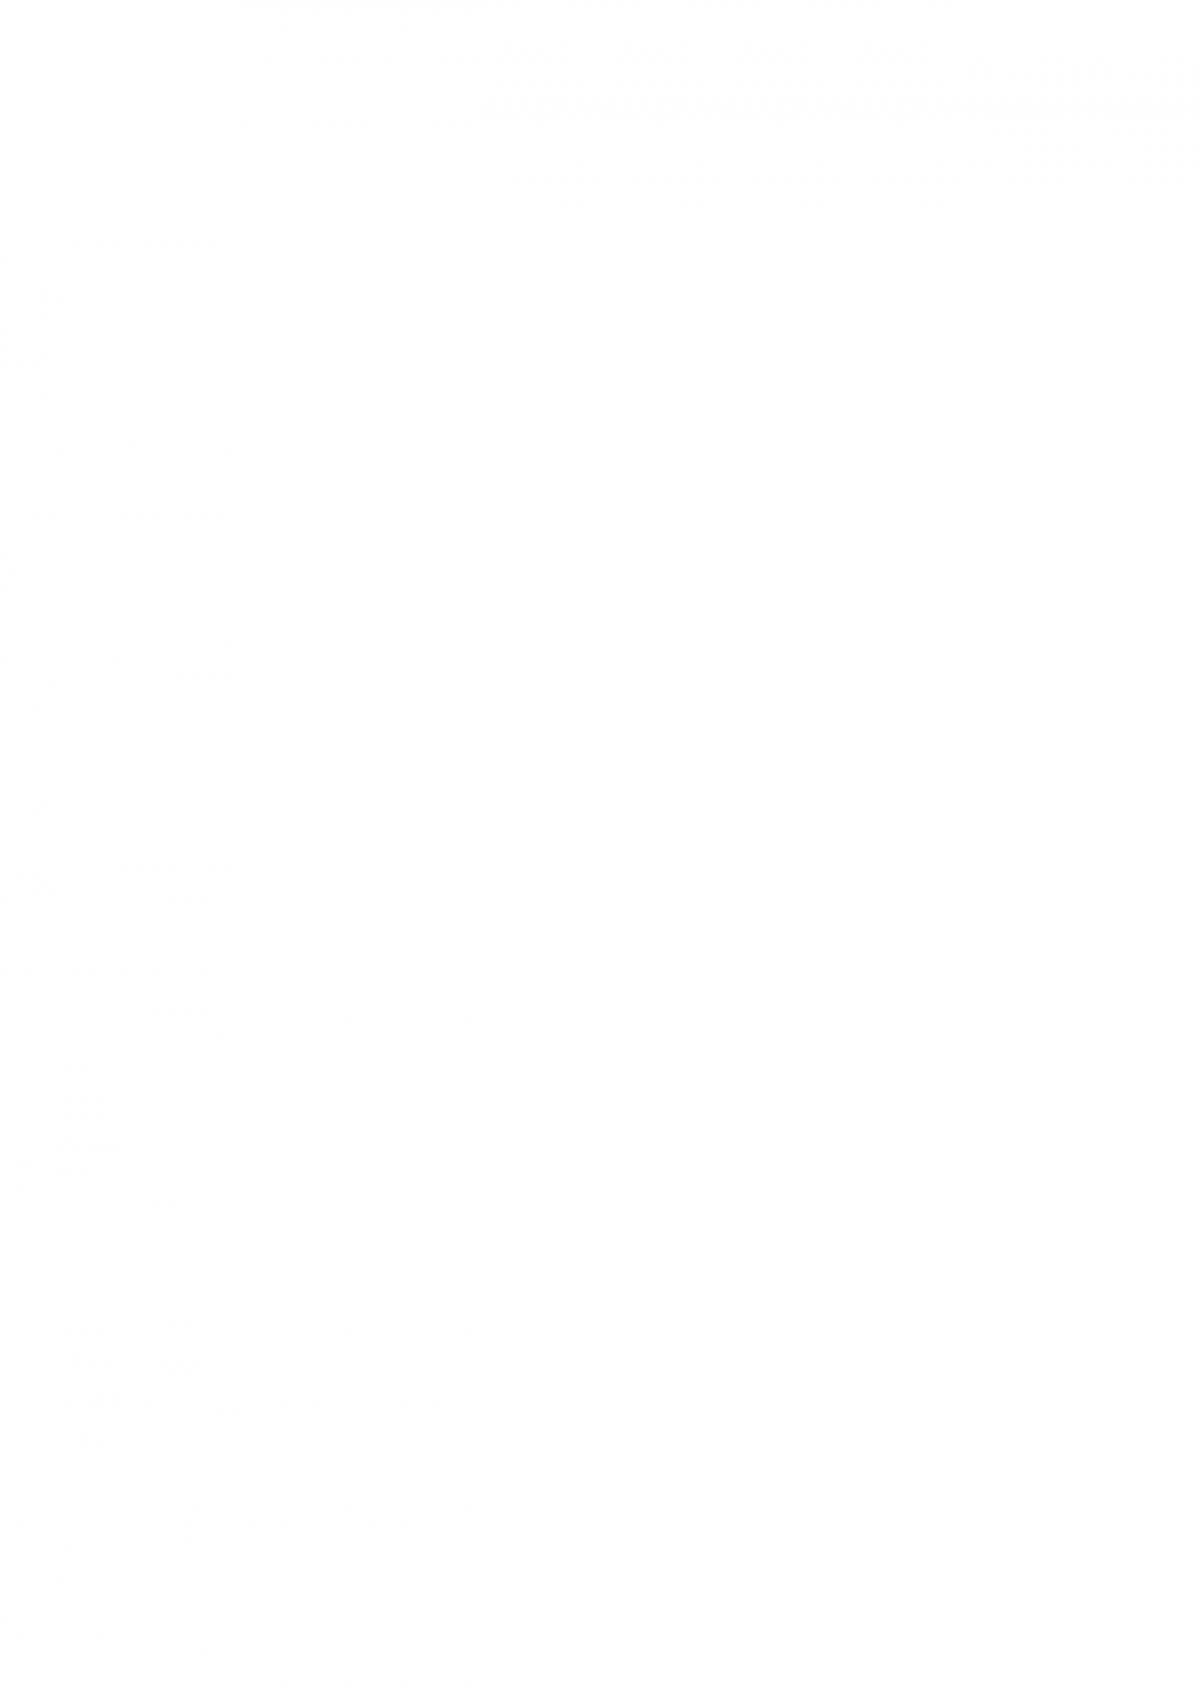 HentaiVN.net - Ảnh 25 - Shio-chan to Osoto de Asobou - Oneshot